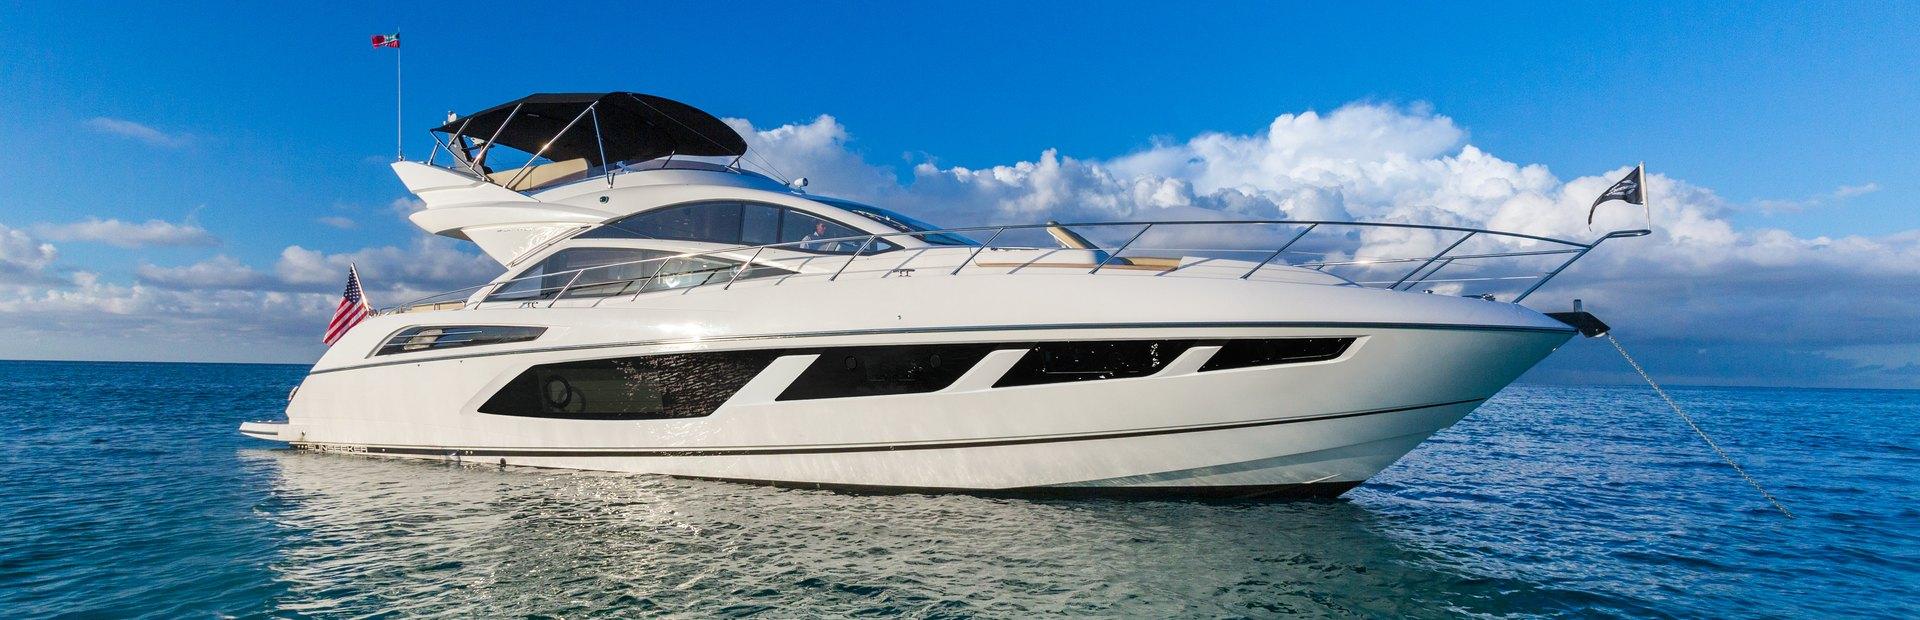 68 Sport Yacht Yacht Charter